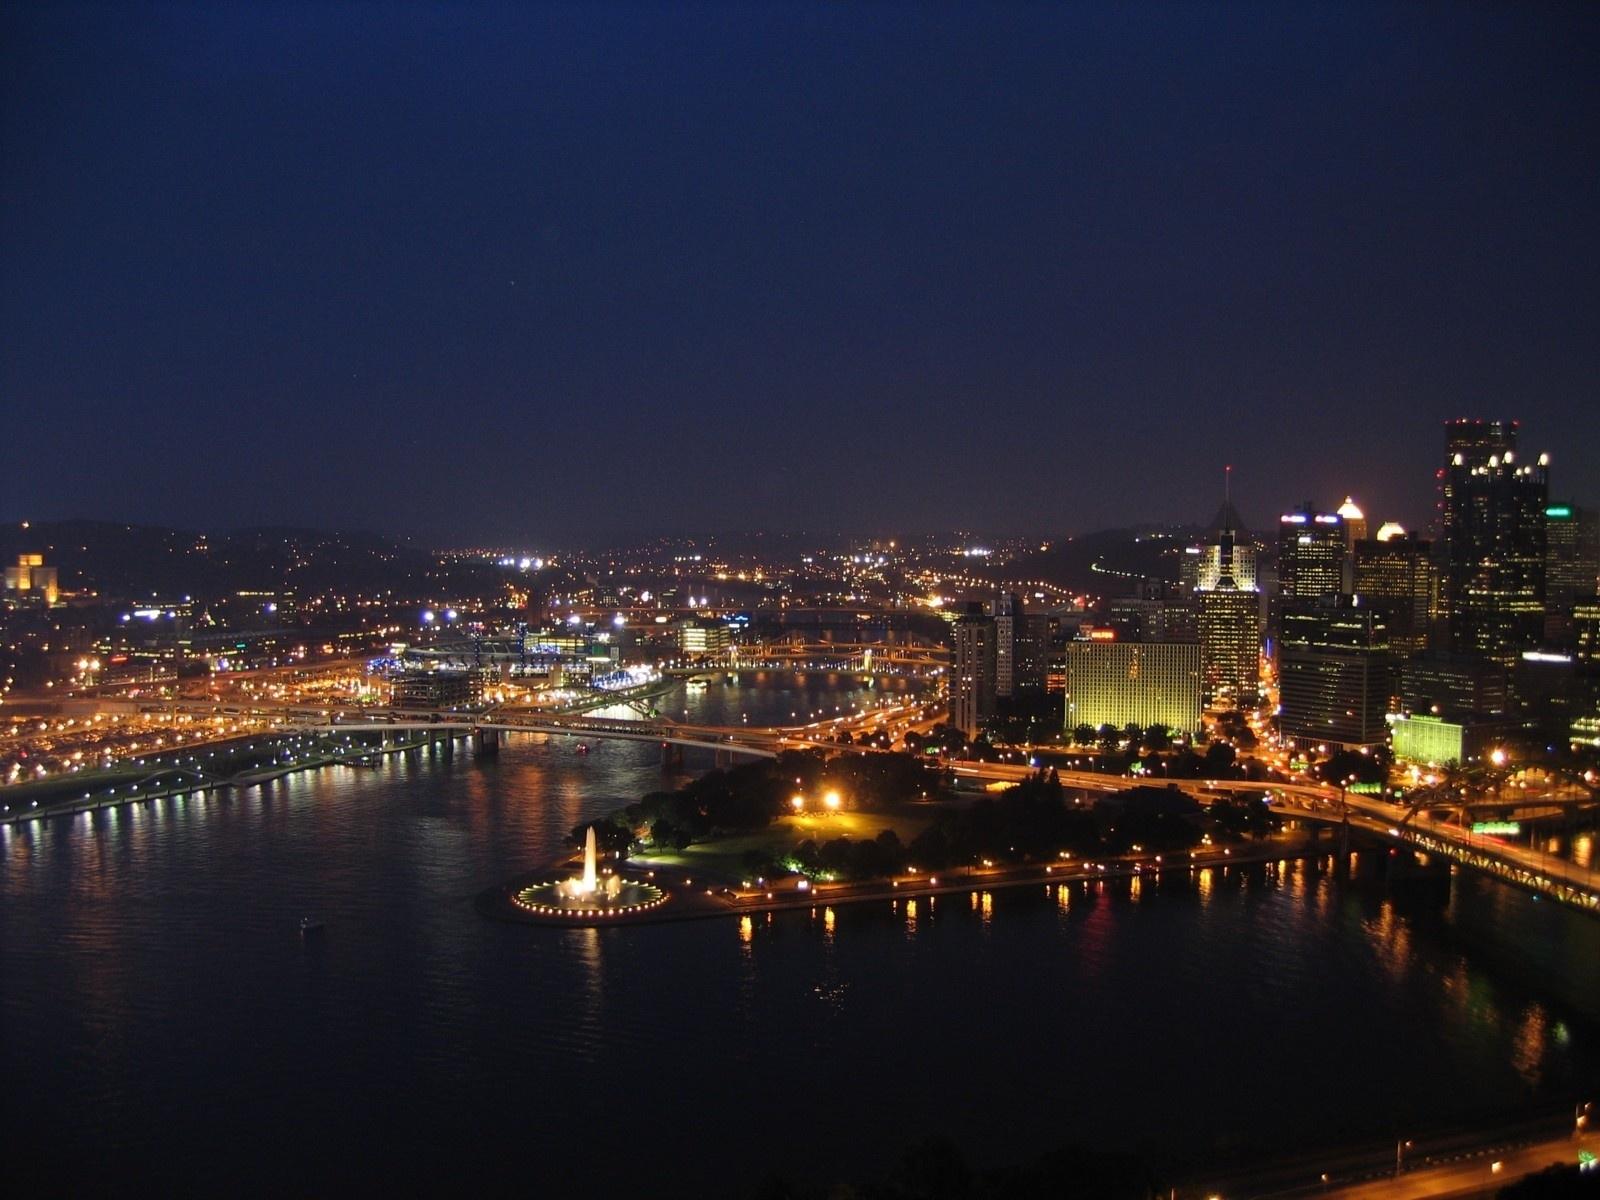 Pittsburgh Desktop Wallpaper Skyline: Pittsburgh Scenes Wallpaper For Desktop